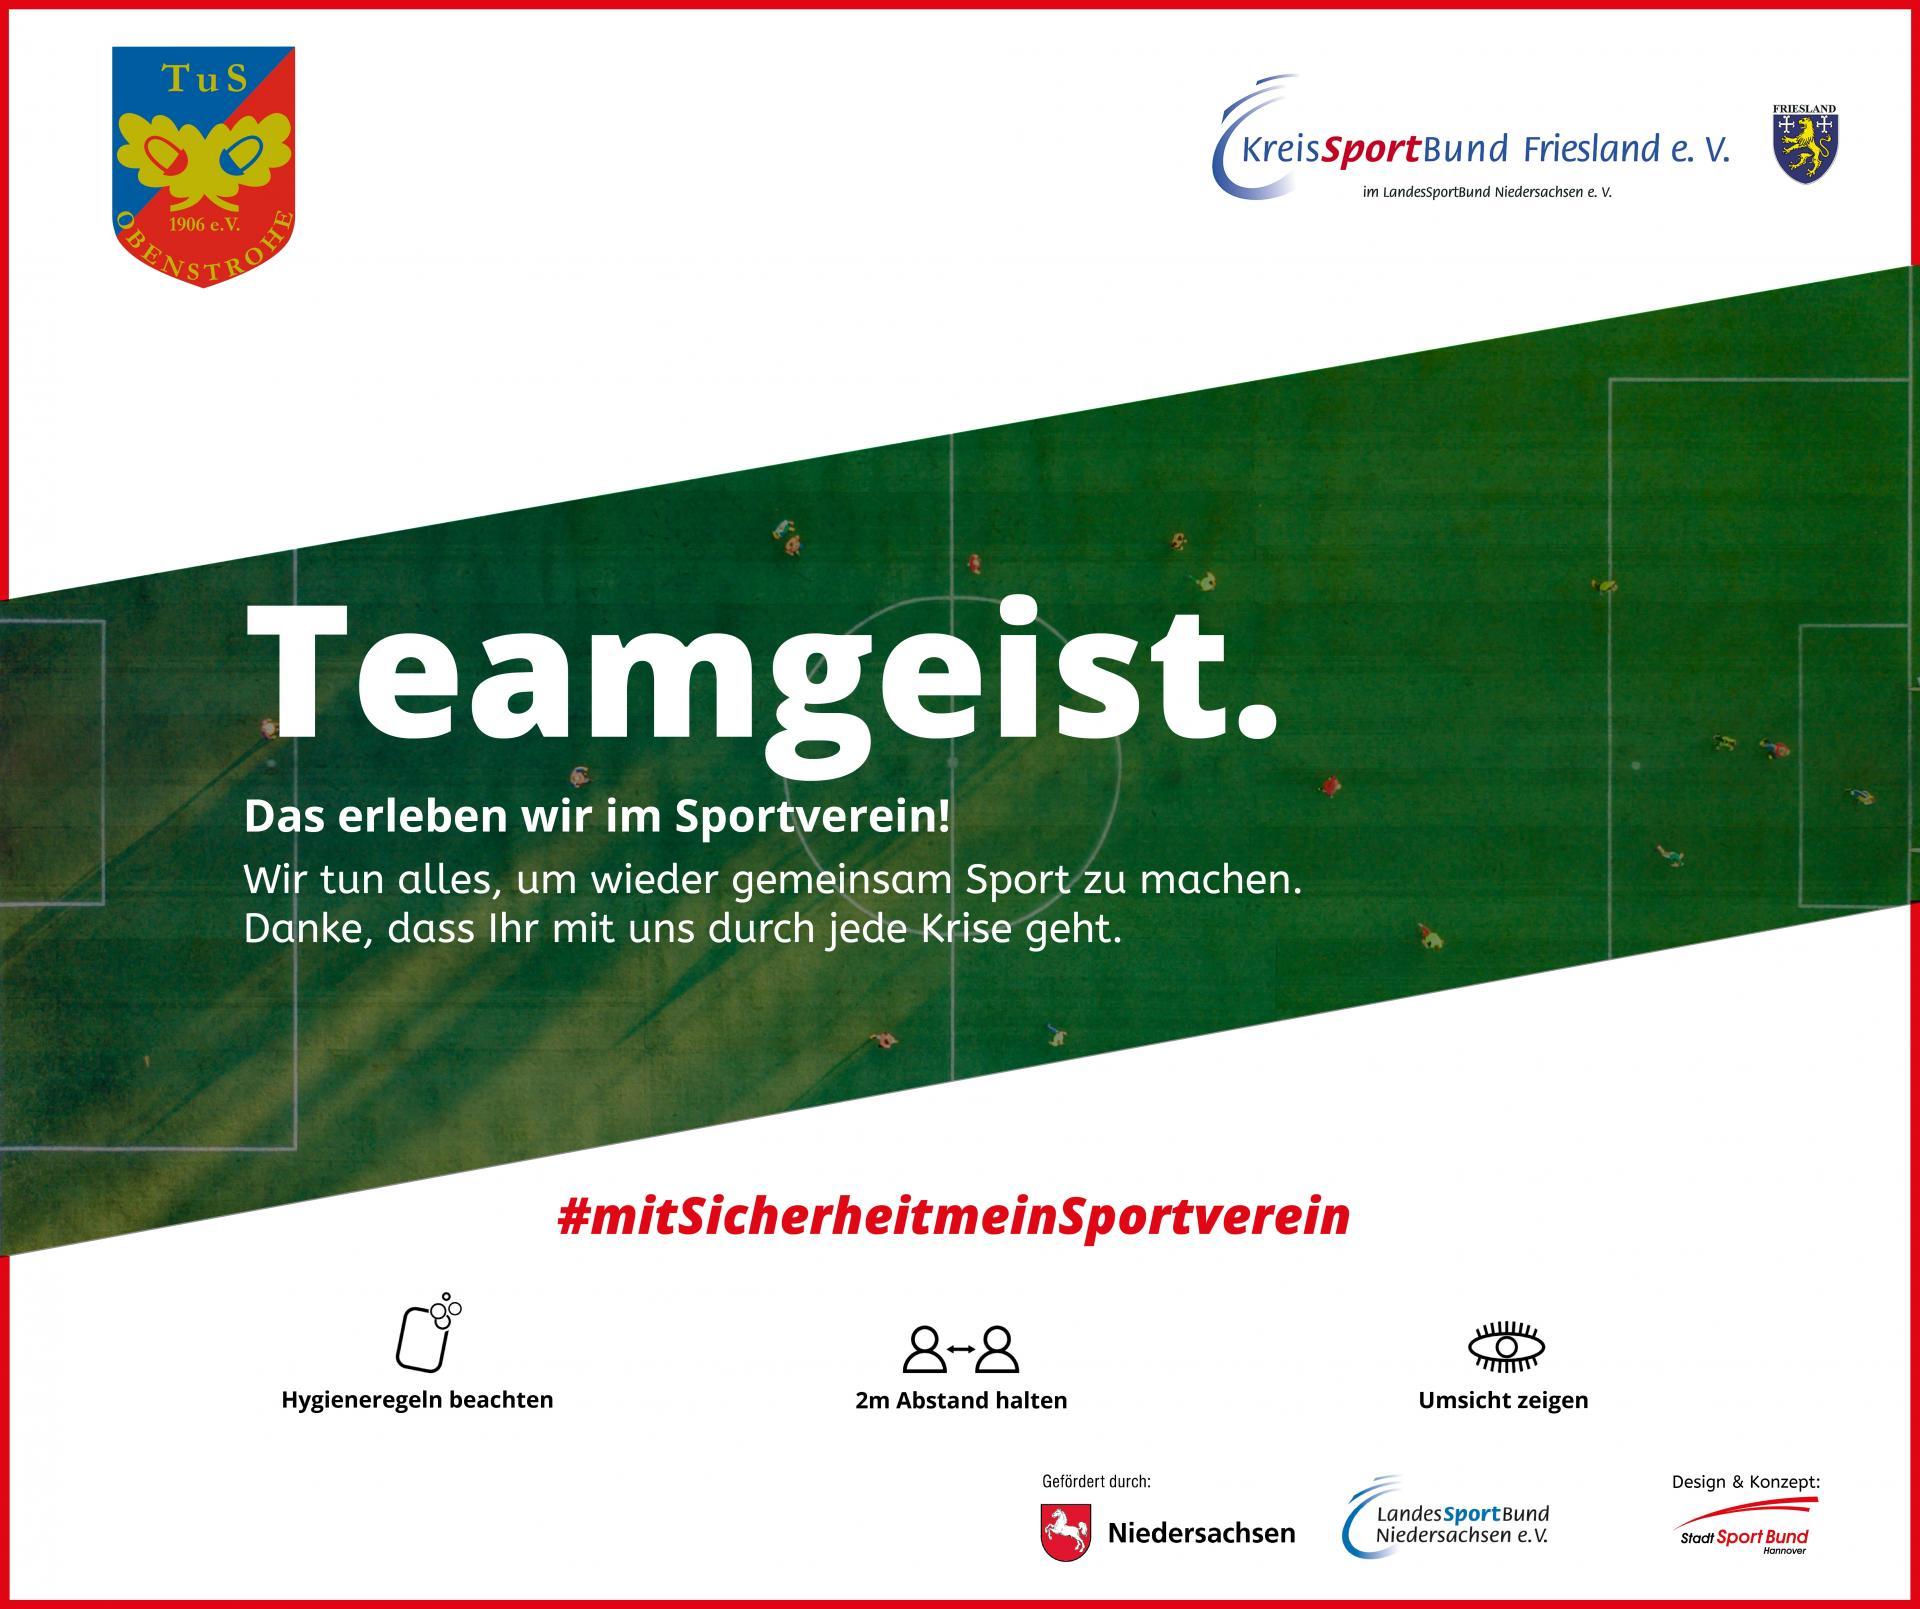 TuS Obenstrohe - #mitSicherheitmeinSportverein